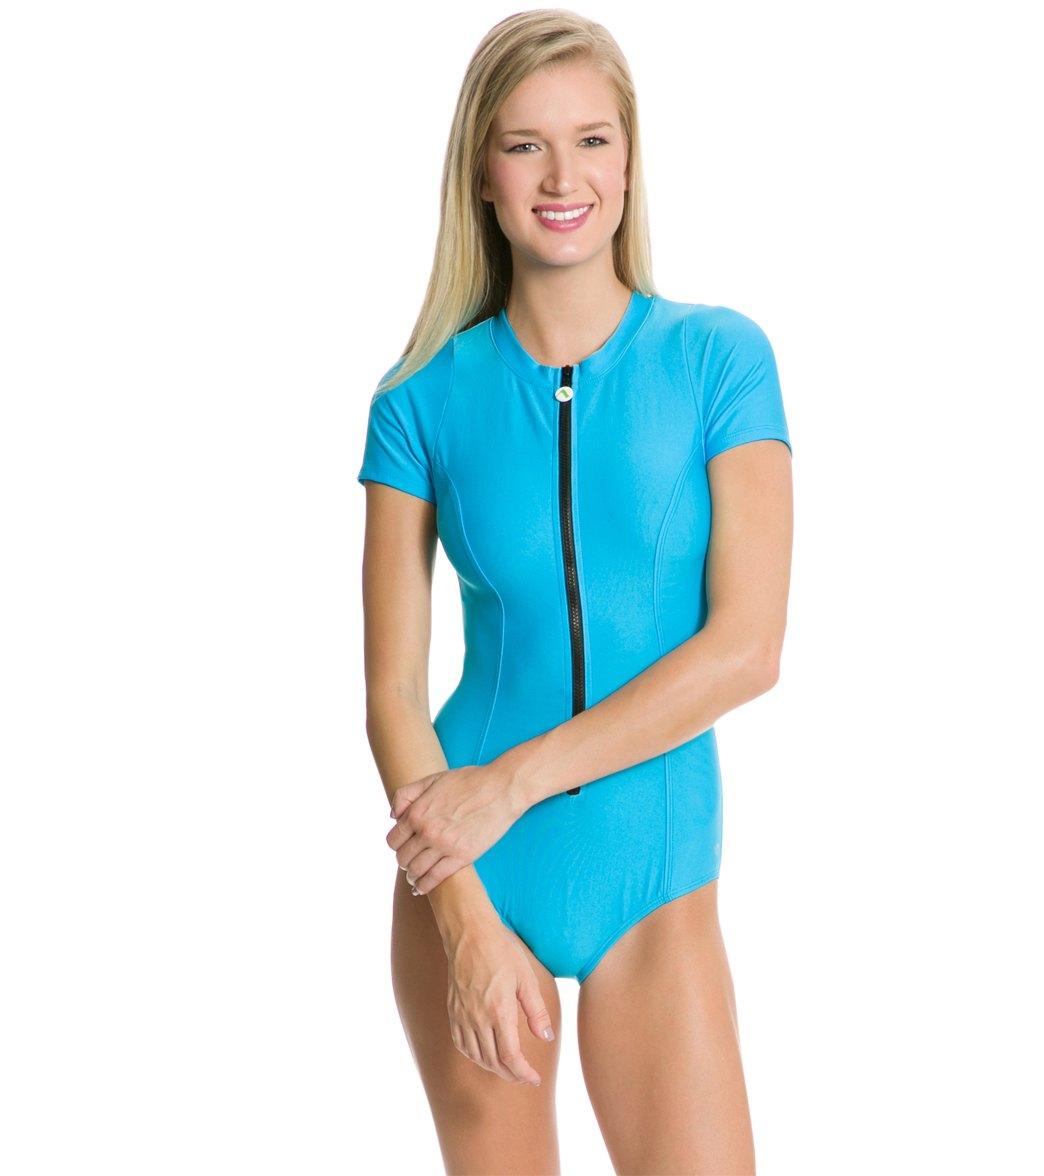 963fdfbdb0ad8 ... Next Good Karma Solid Malibu Zip Short Sleeve One Piece Swimsuit. Play  Video. MODEL MEASUREMENTS